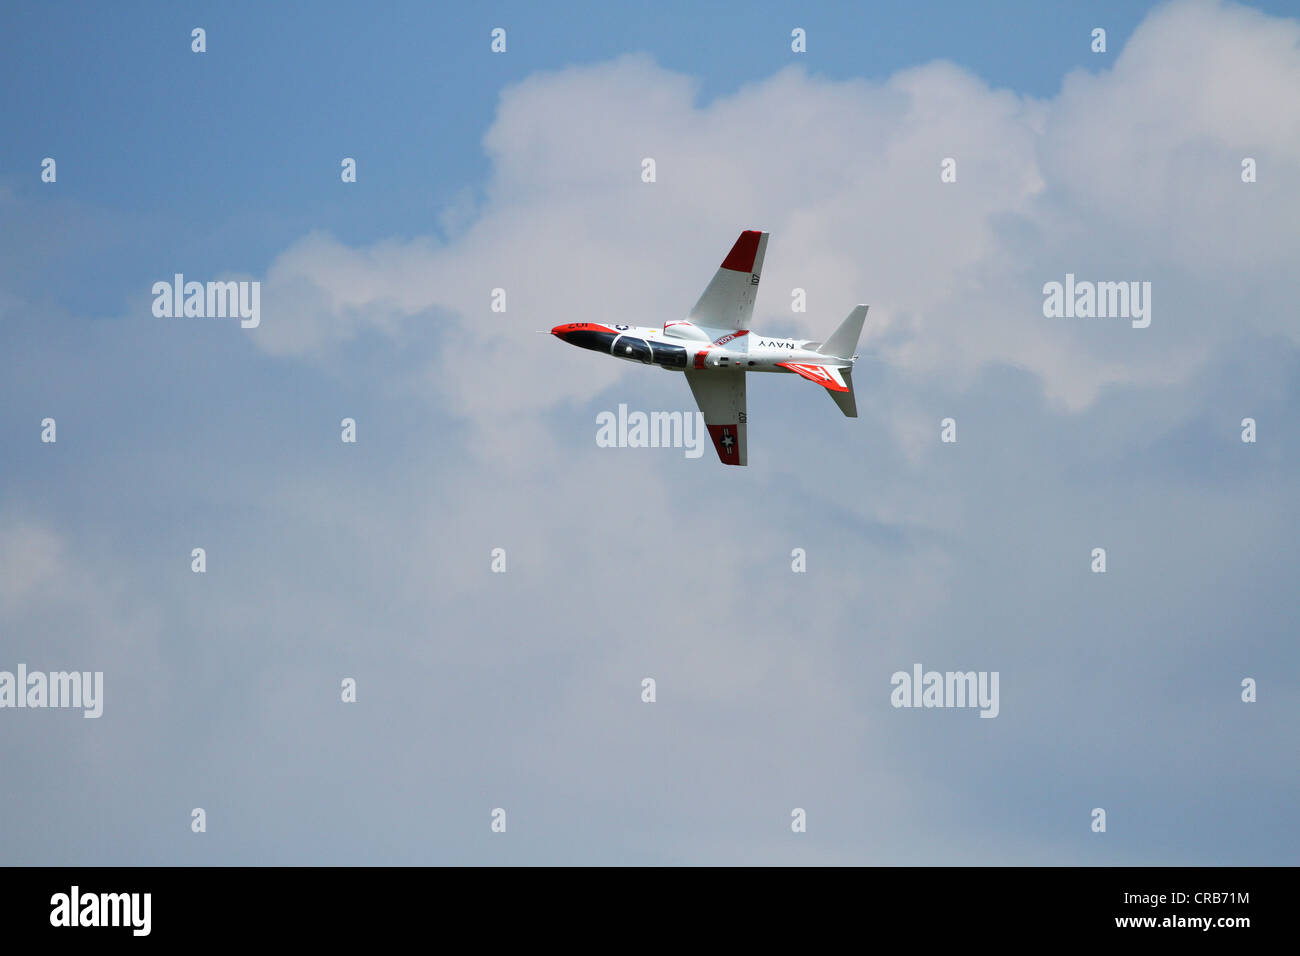 Radio Controlled Model Jet Airplane. - Stock Image